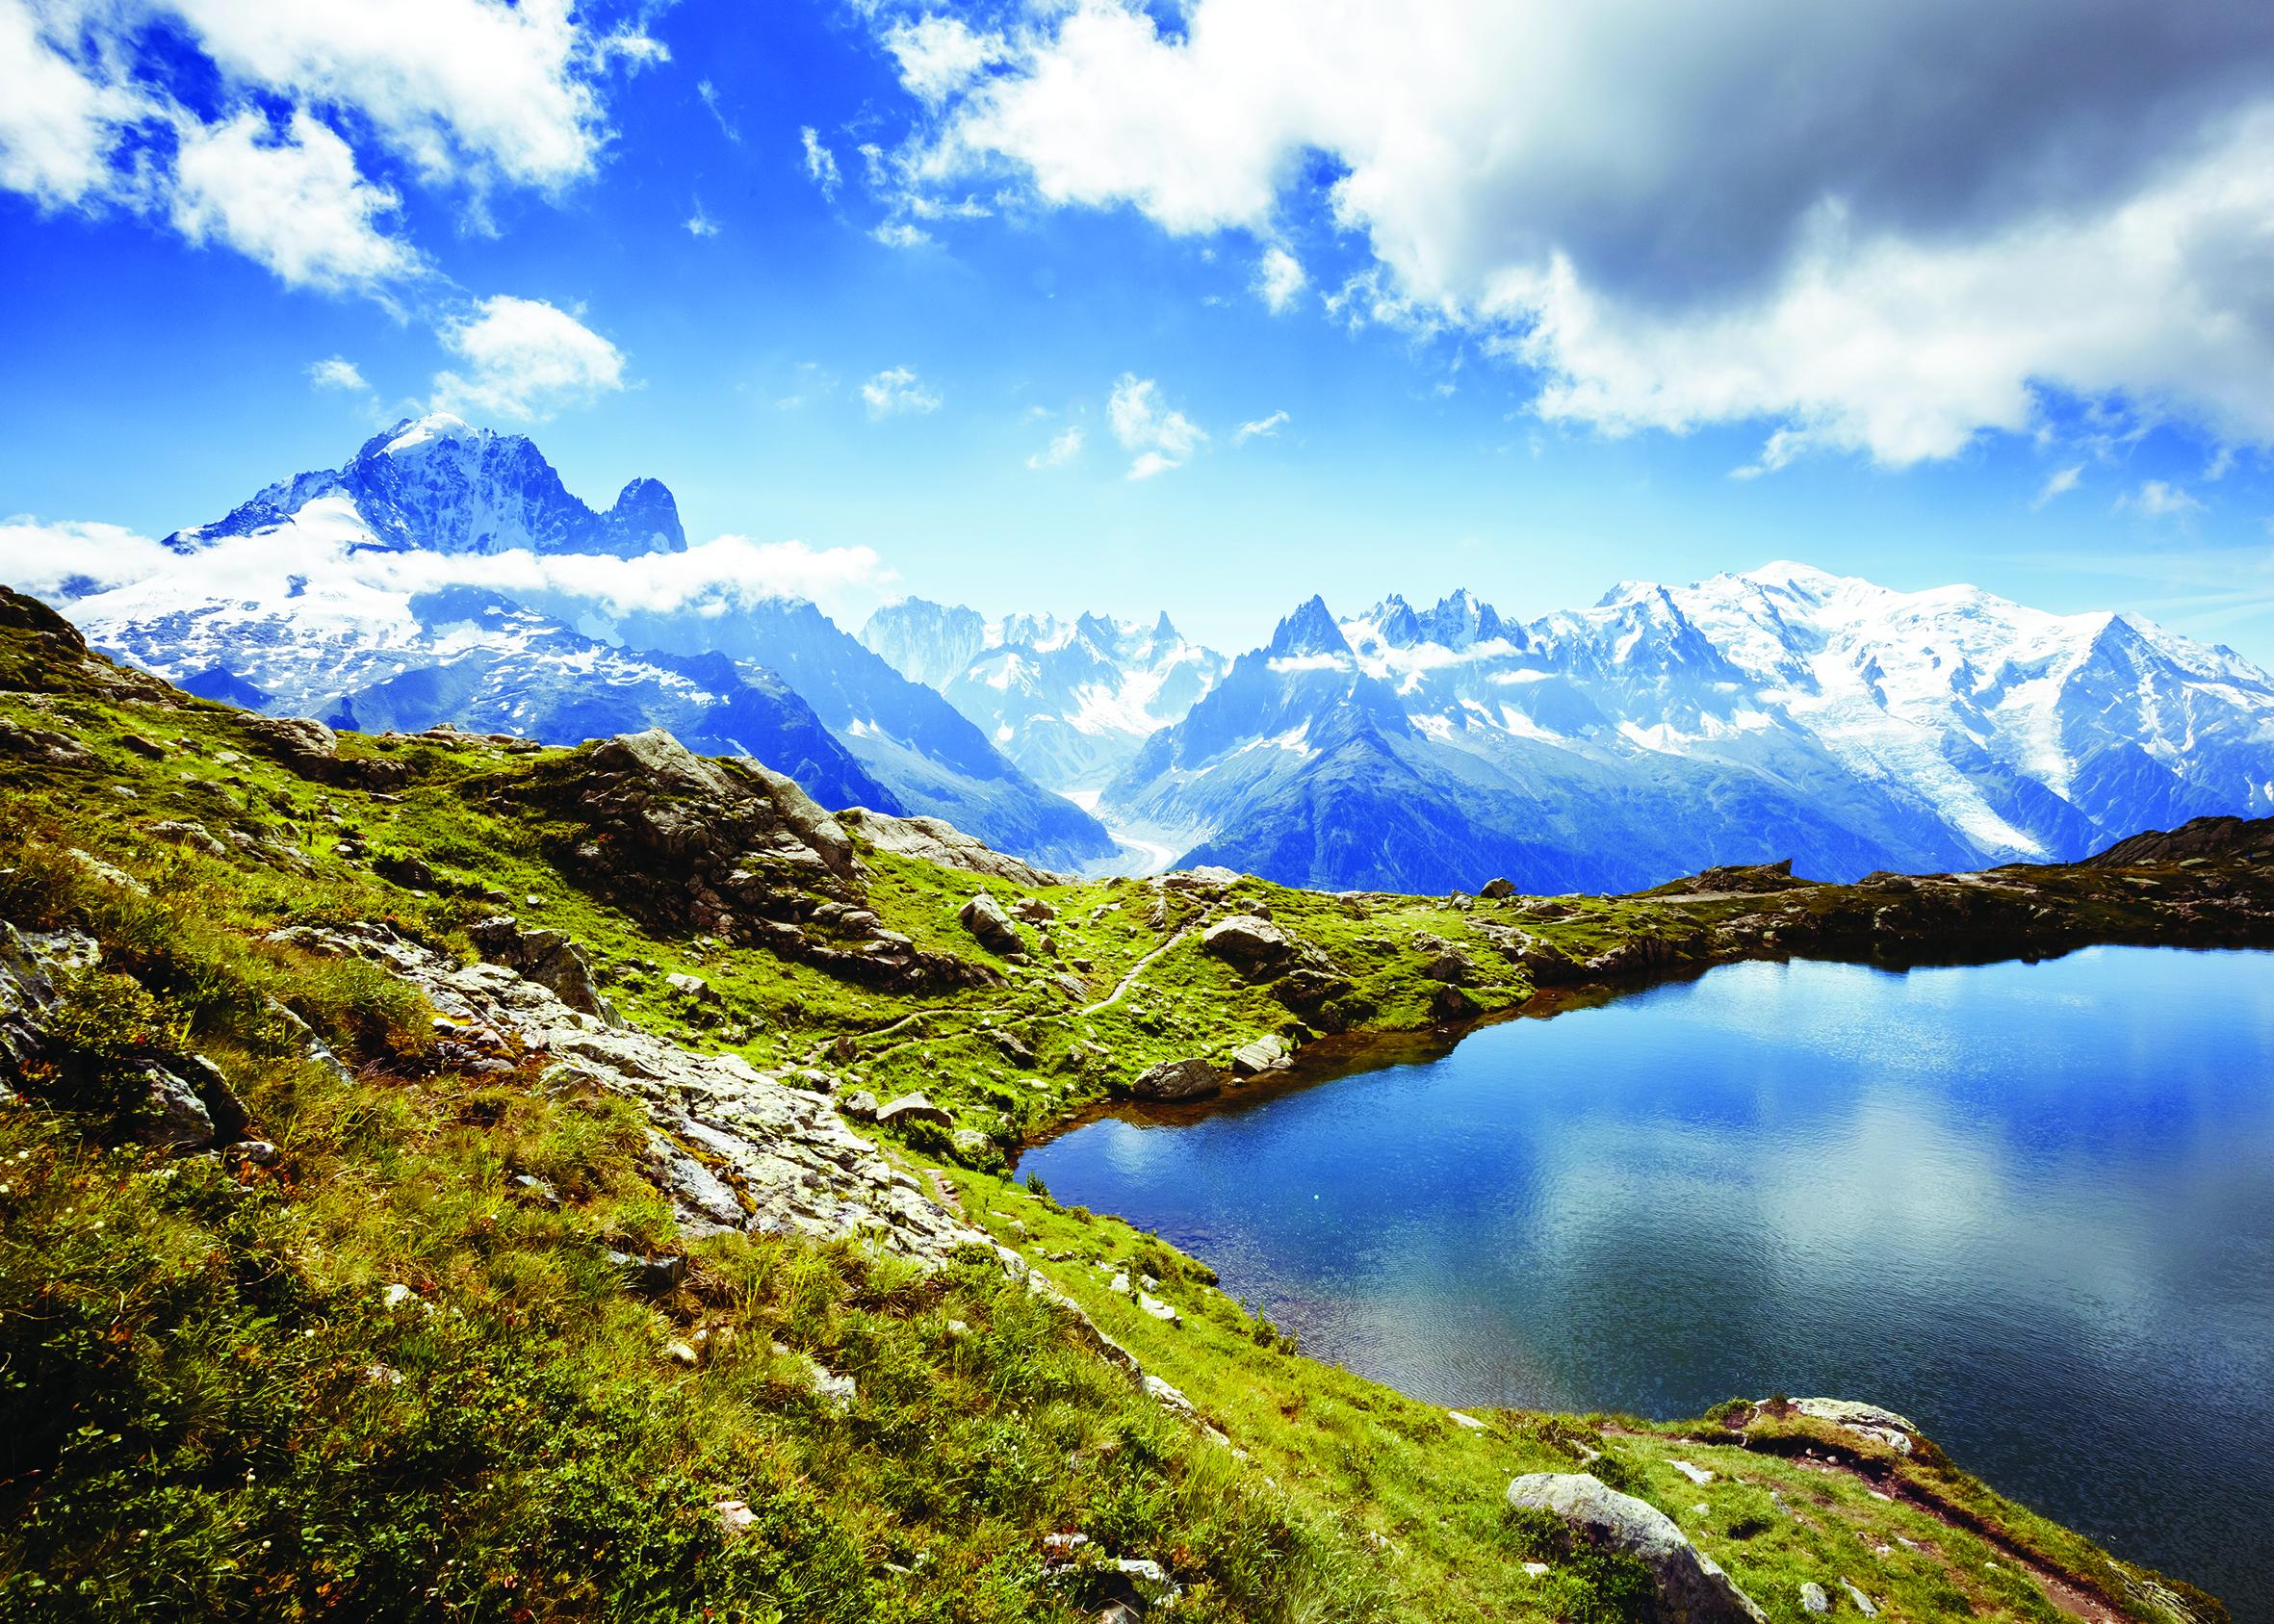 Mont Blanc Hotel Trek - Trek through three countries around Europe's highest peakFrom £1925